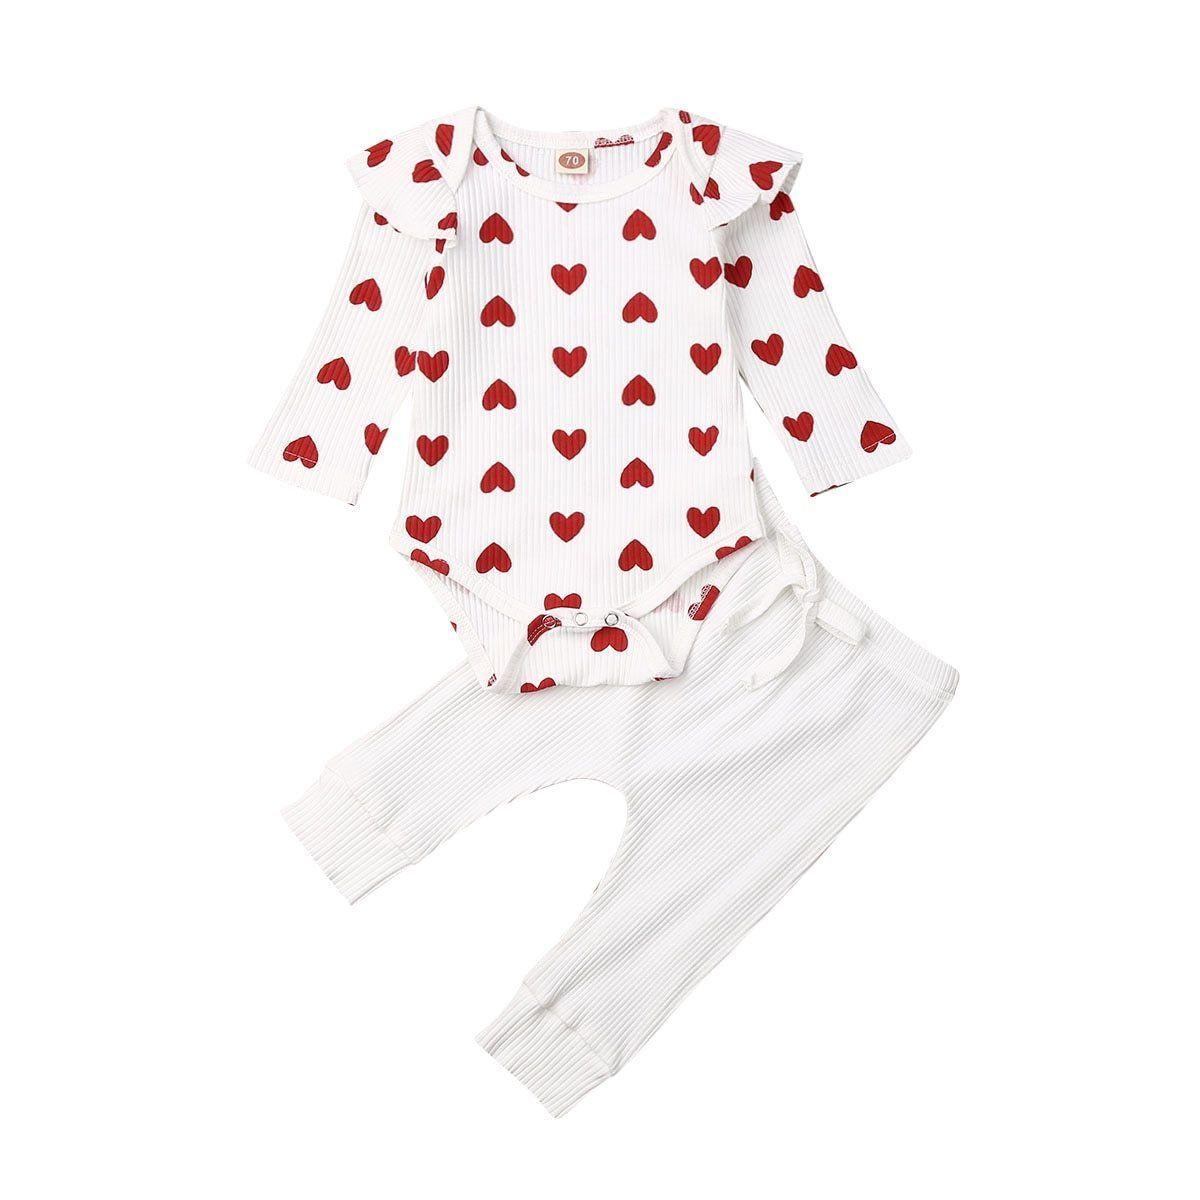 13++ Toddler valentines day pajamas trends